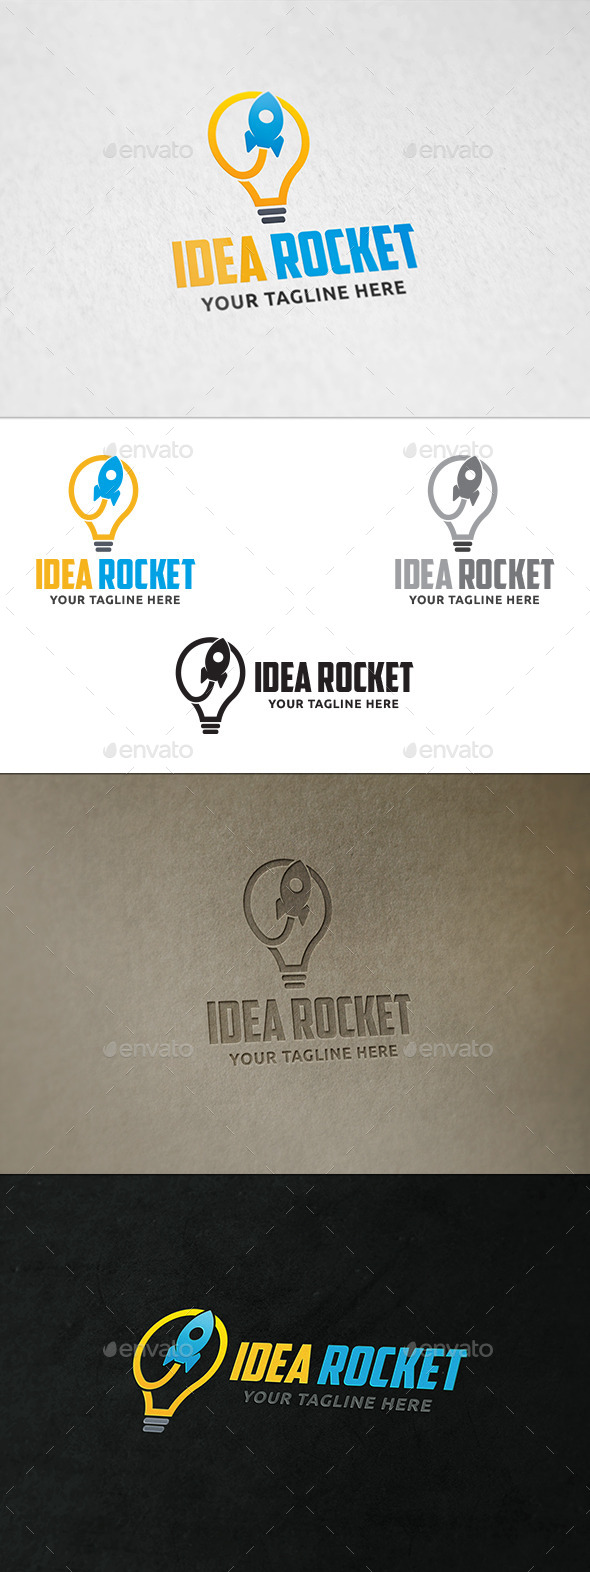 GraphicRiver Idea Rocket Logo Template 11091349